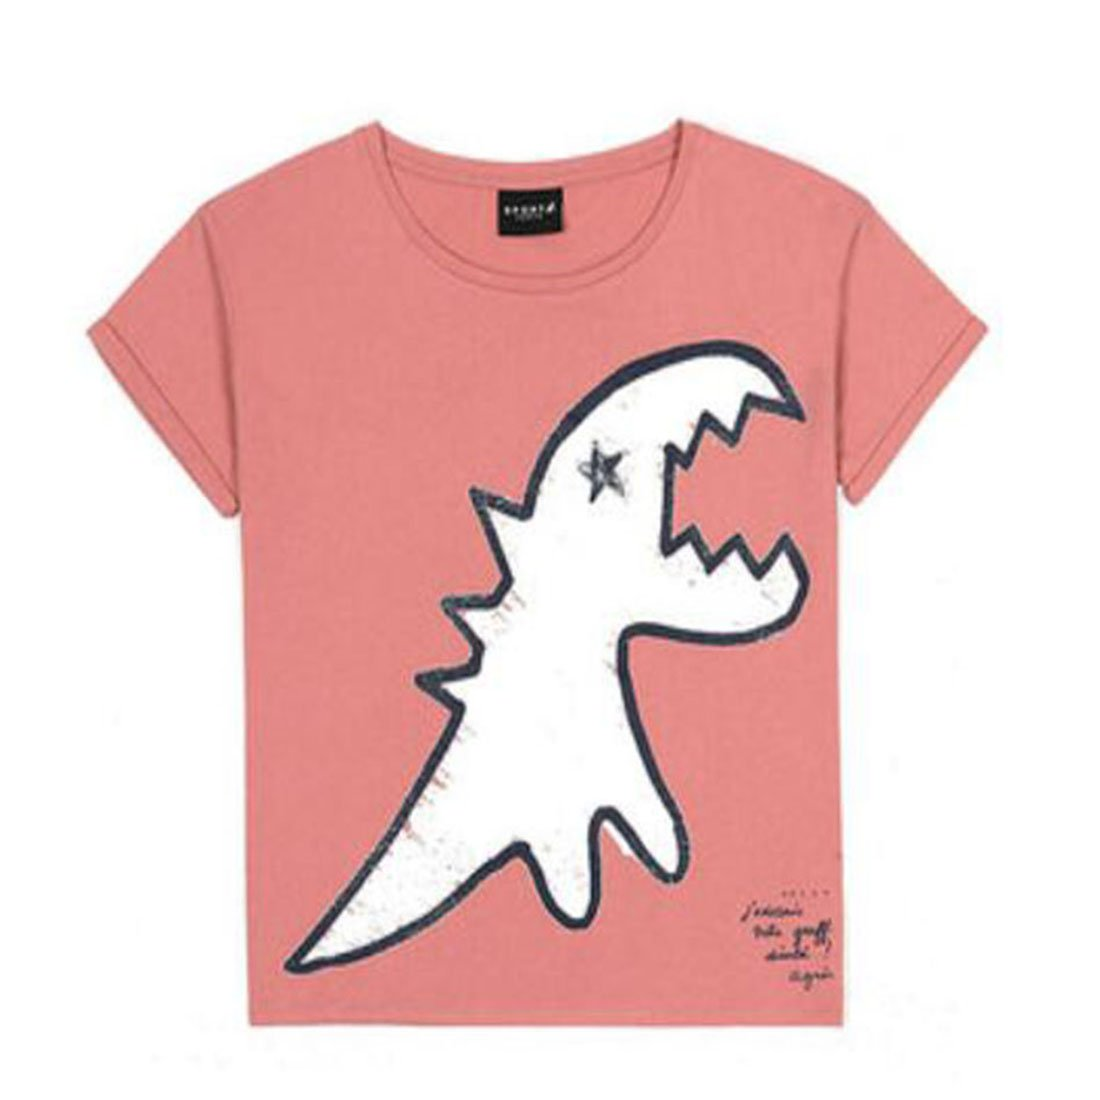 SPORT B.アニエスベー レディース Tシャツ 半袖 カットソー ロゴTシャツ HOMME コットン100%  agnes b. 黒 白 ショップバッグ付き B07CR645PG S ピンク ピンク S